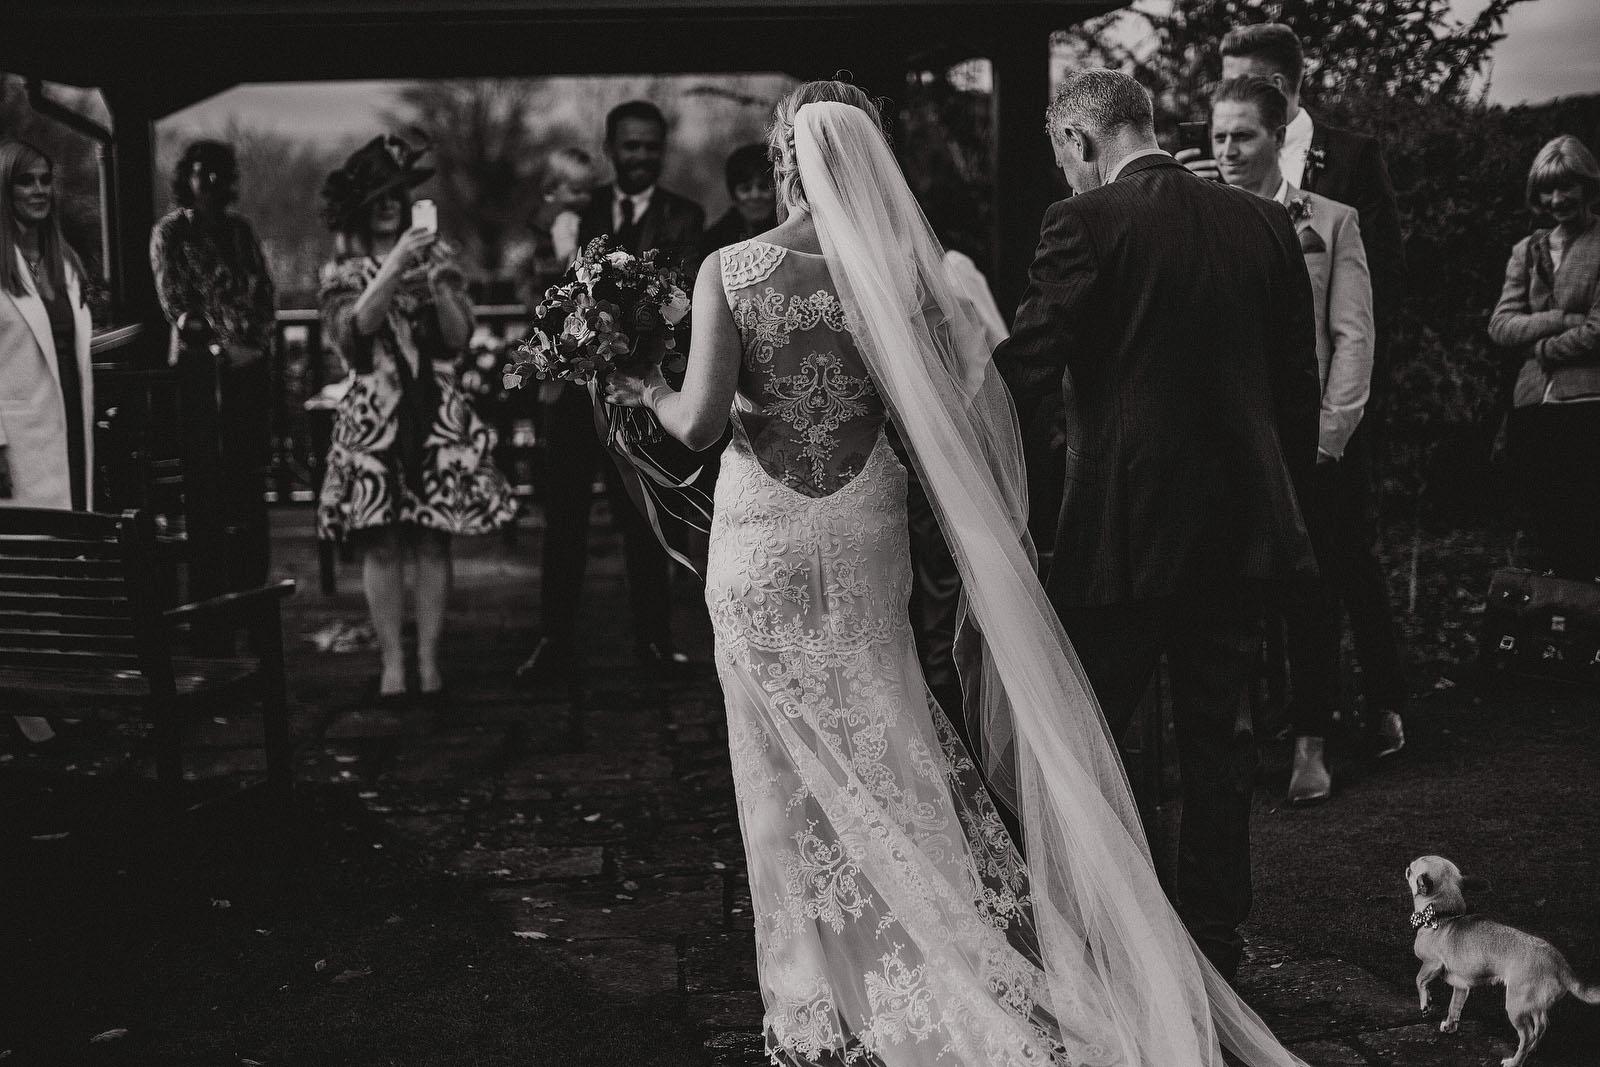 Claire Pettibone wedding dress1